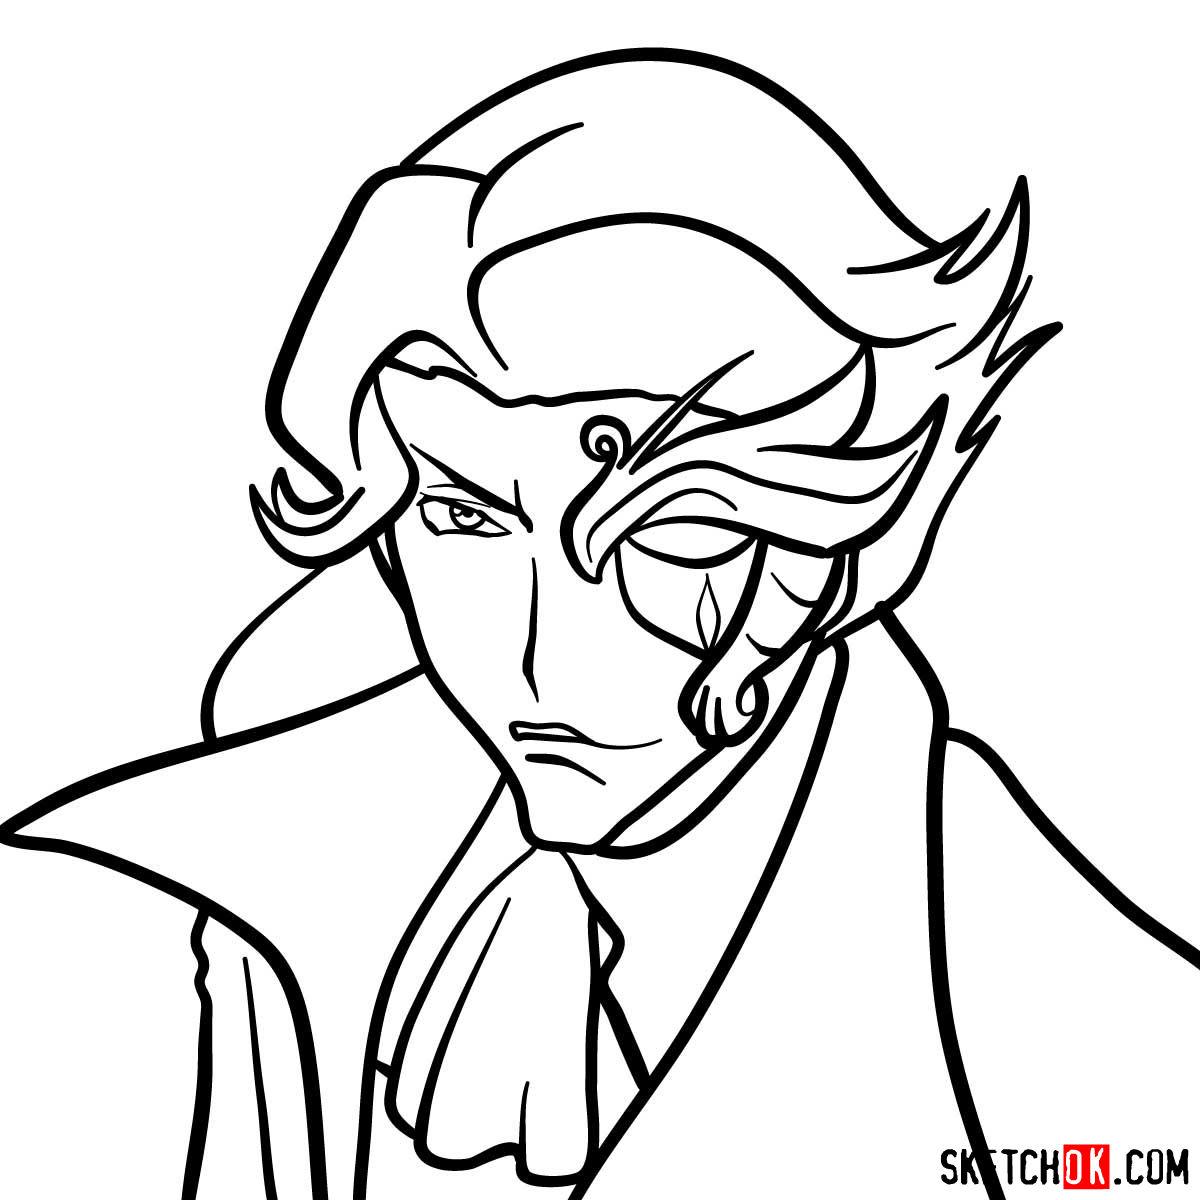 How to draw Jeremiah Gottwald | Code Geass anime - step 10